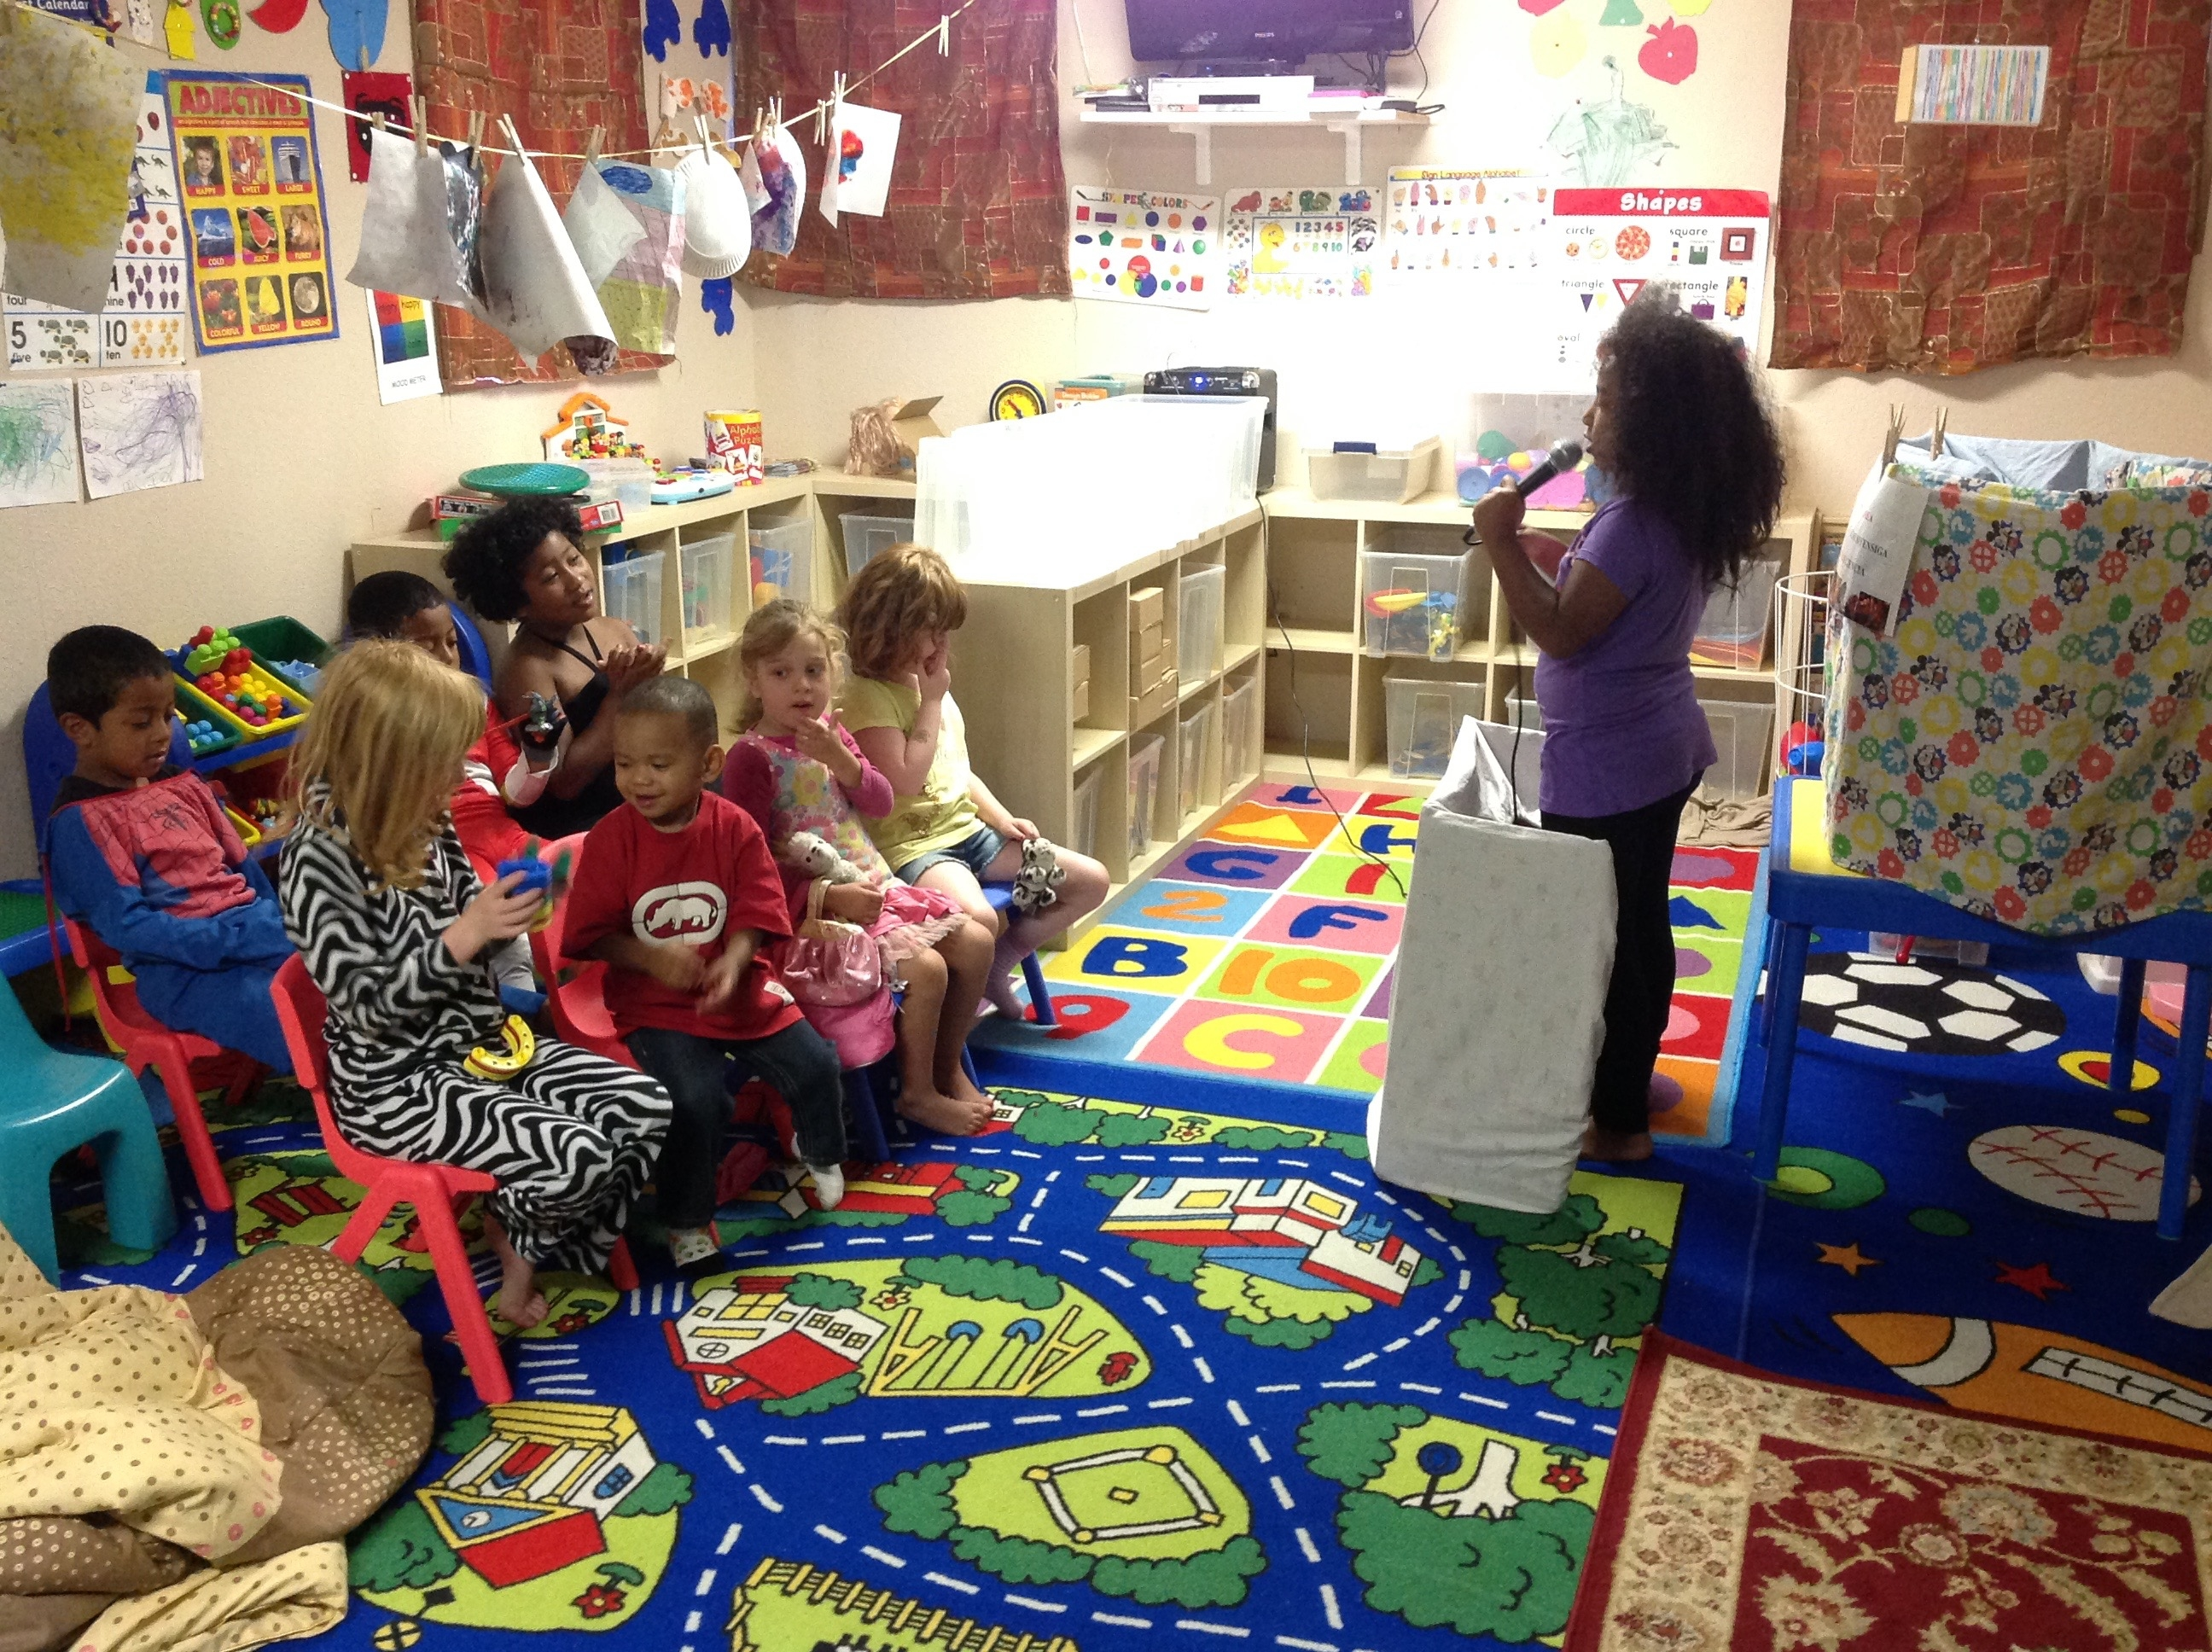 Hidaya Family Child Care LLC image 2